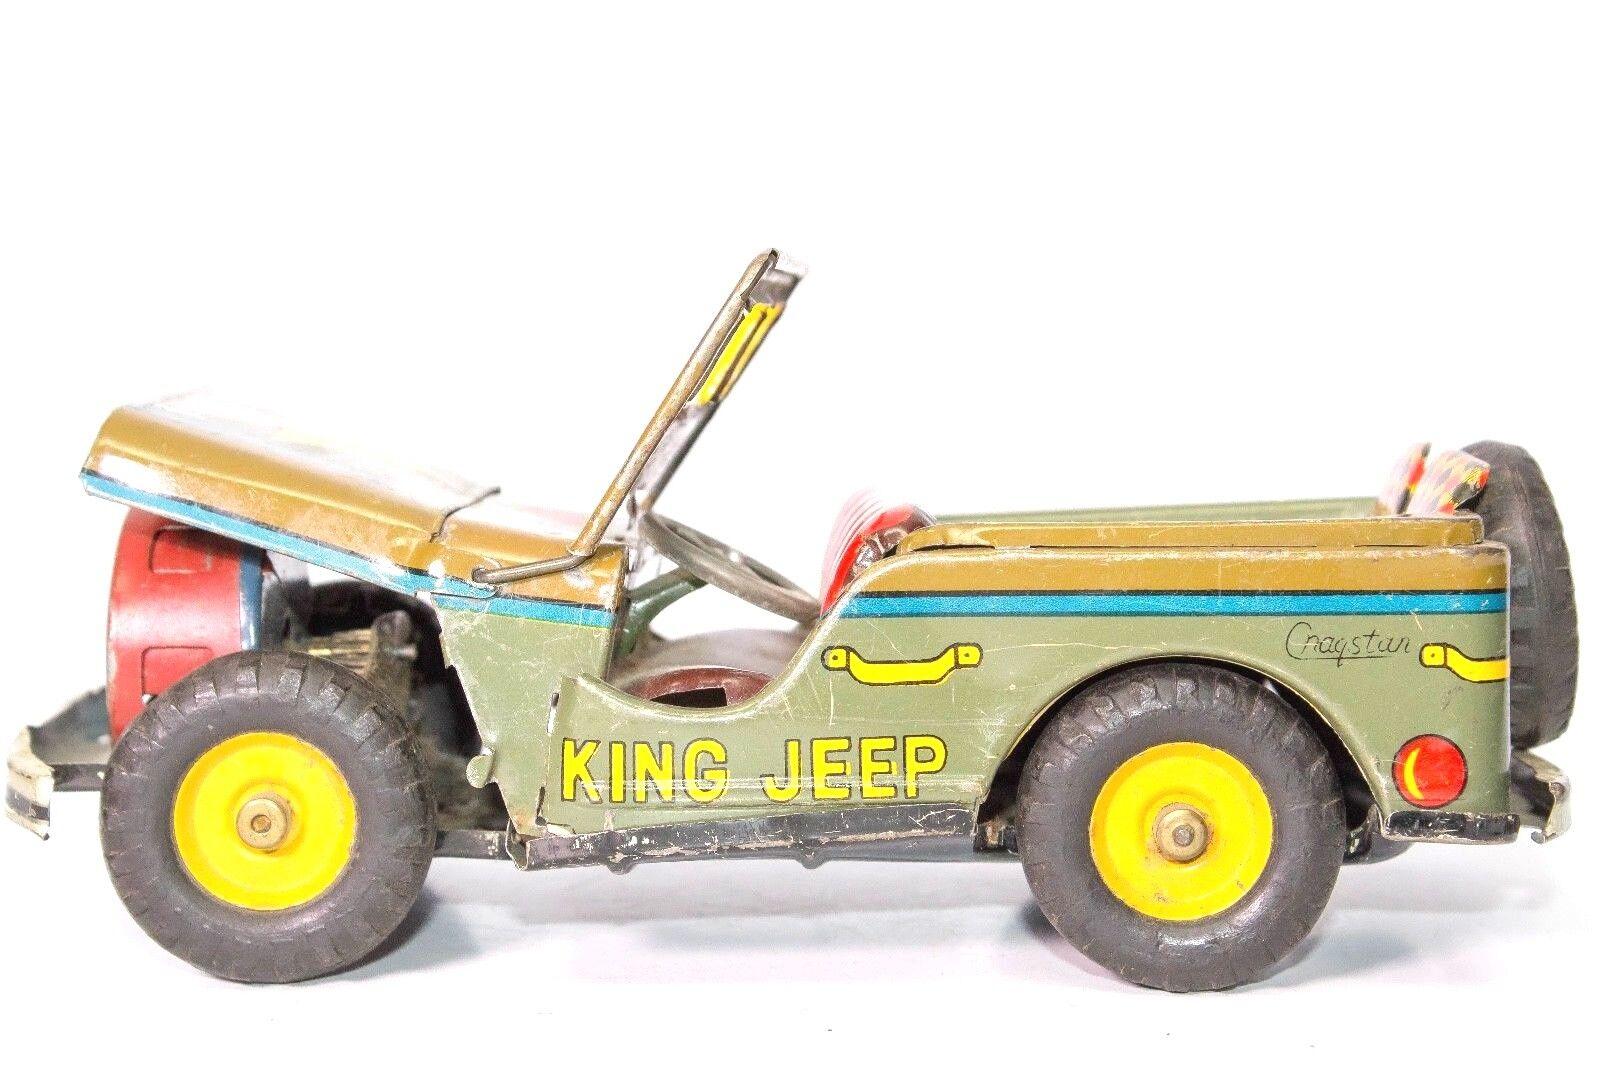 Vintage 594mS King Jeep M38 2-door Blech Friction von Cragstan Japan